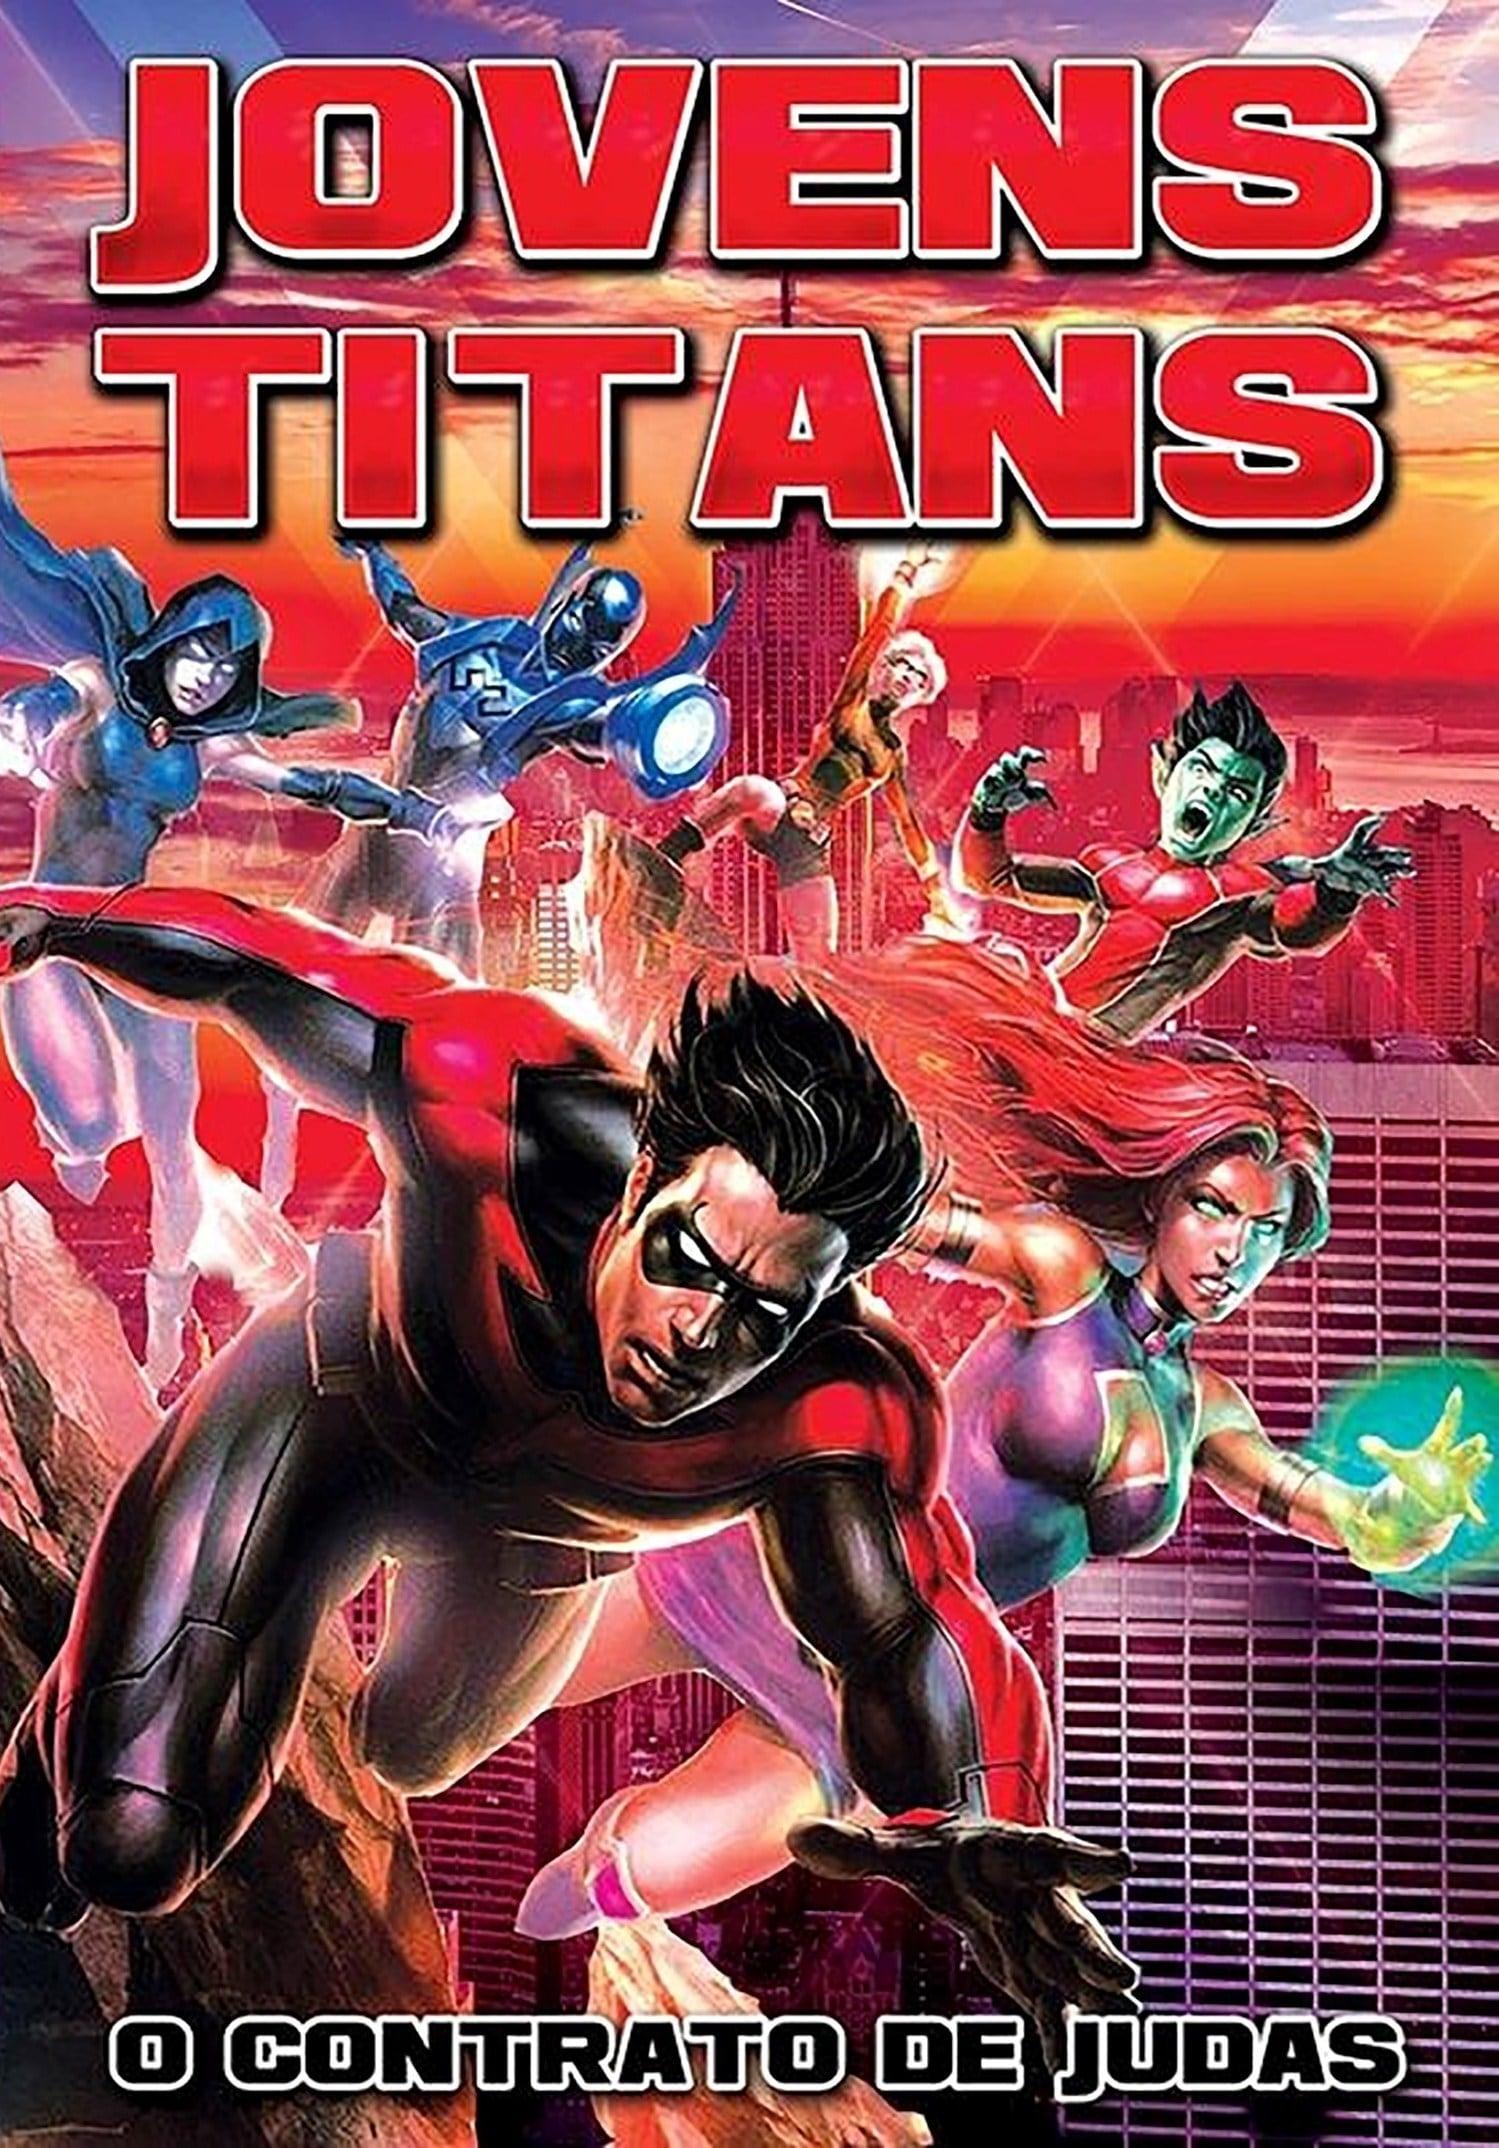 Teen Titans The Judas Contract 2017 Watch Online Hd -3755